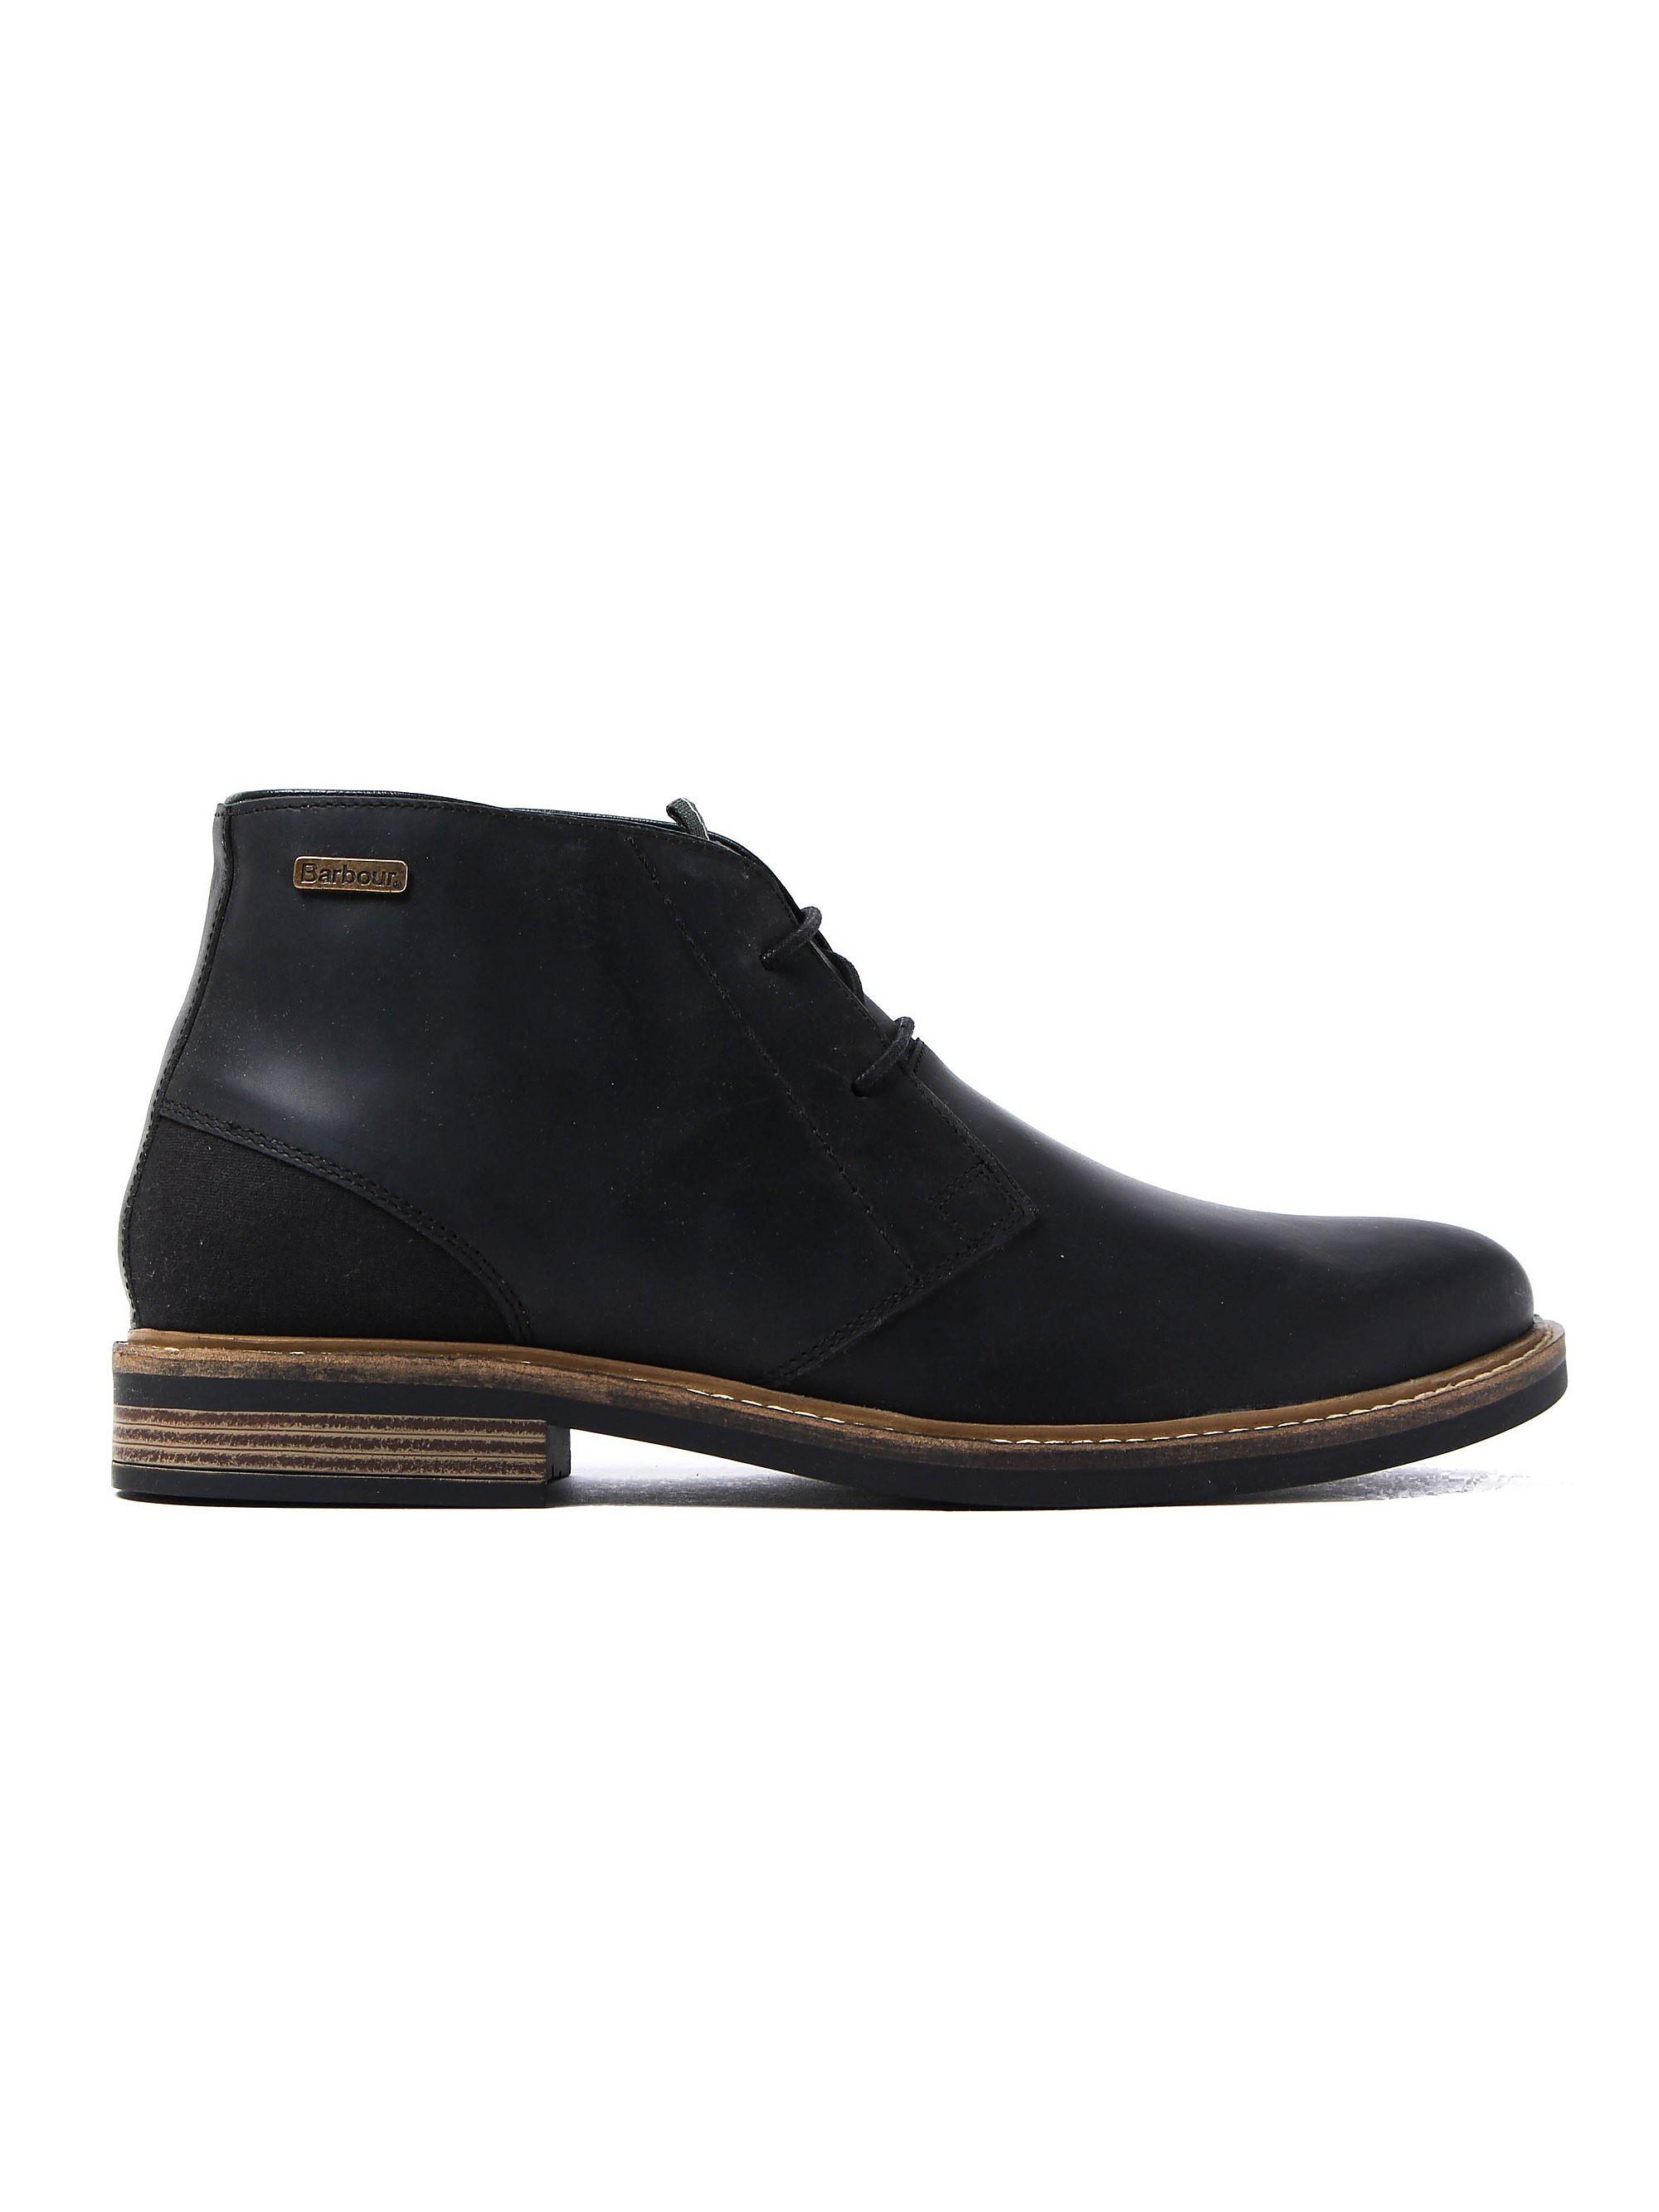 Barbour Readhead Classic 2 Eyelet Chukka Boots - Black